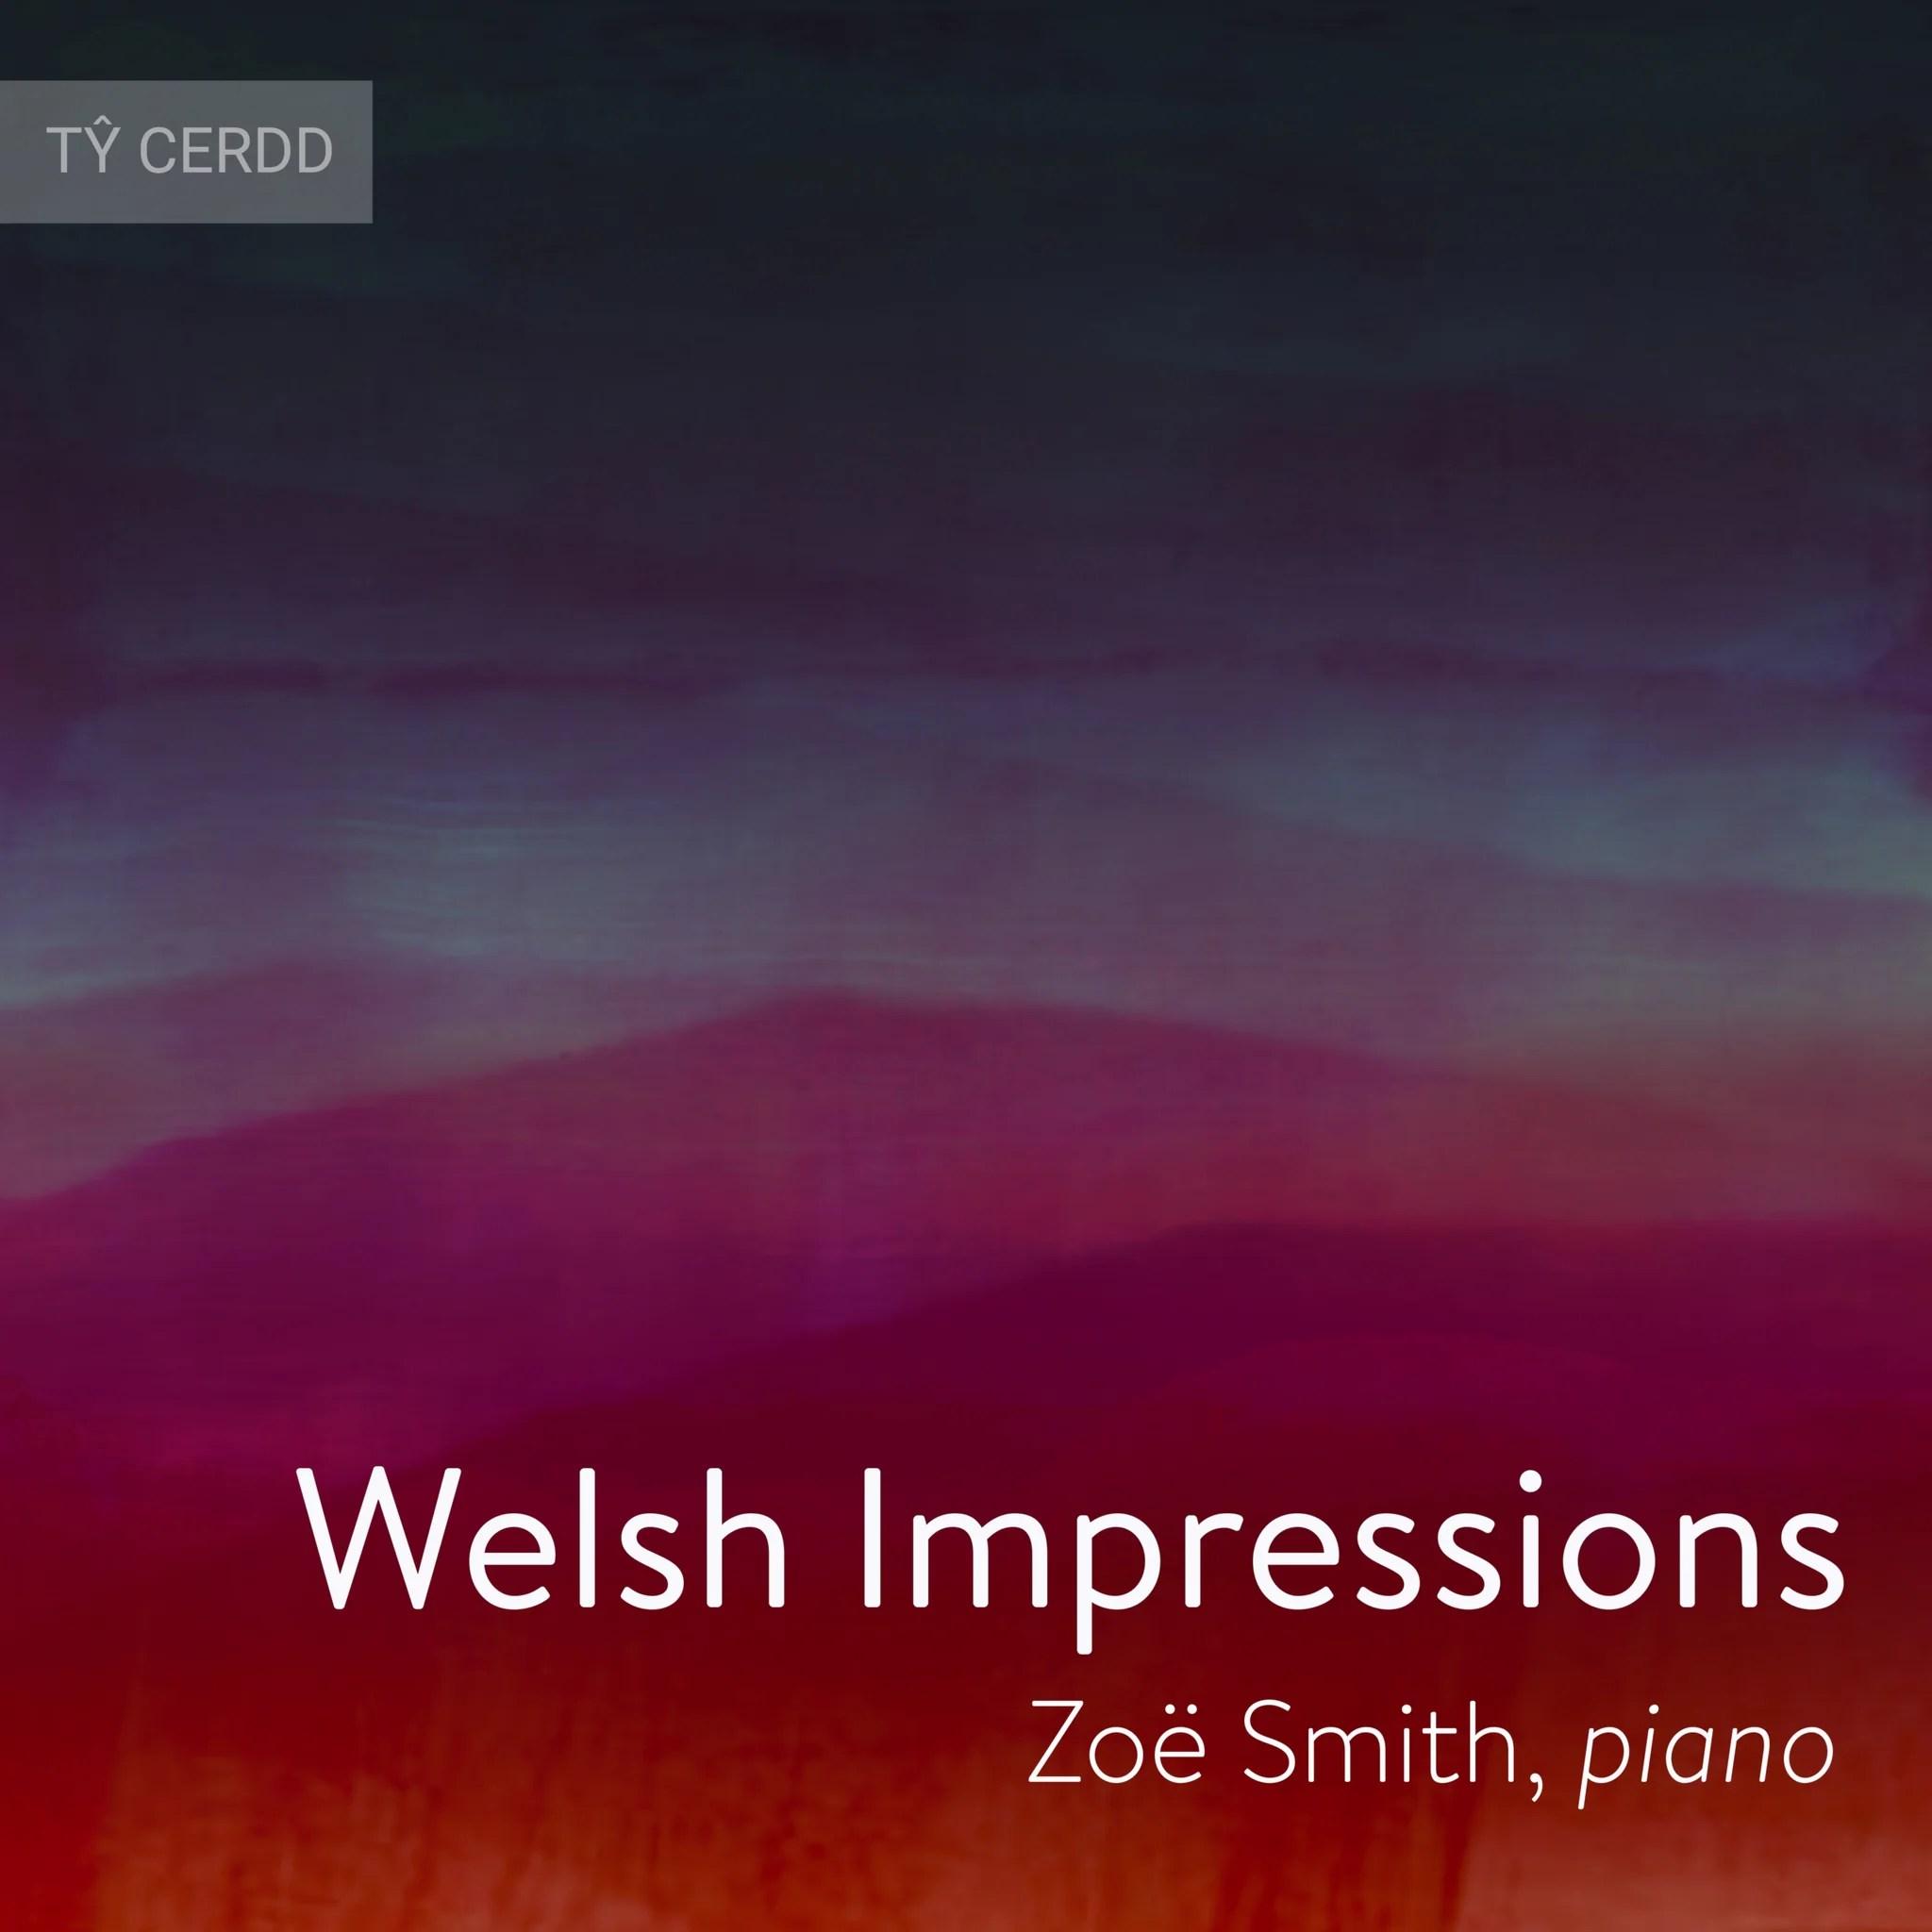 Welsh Impressions, Zoë Smith, piano